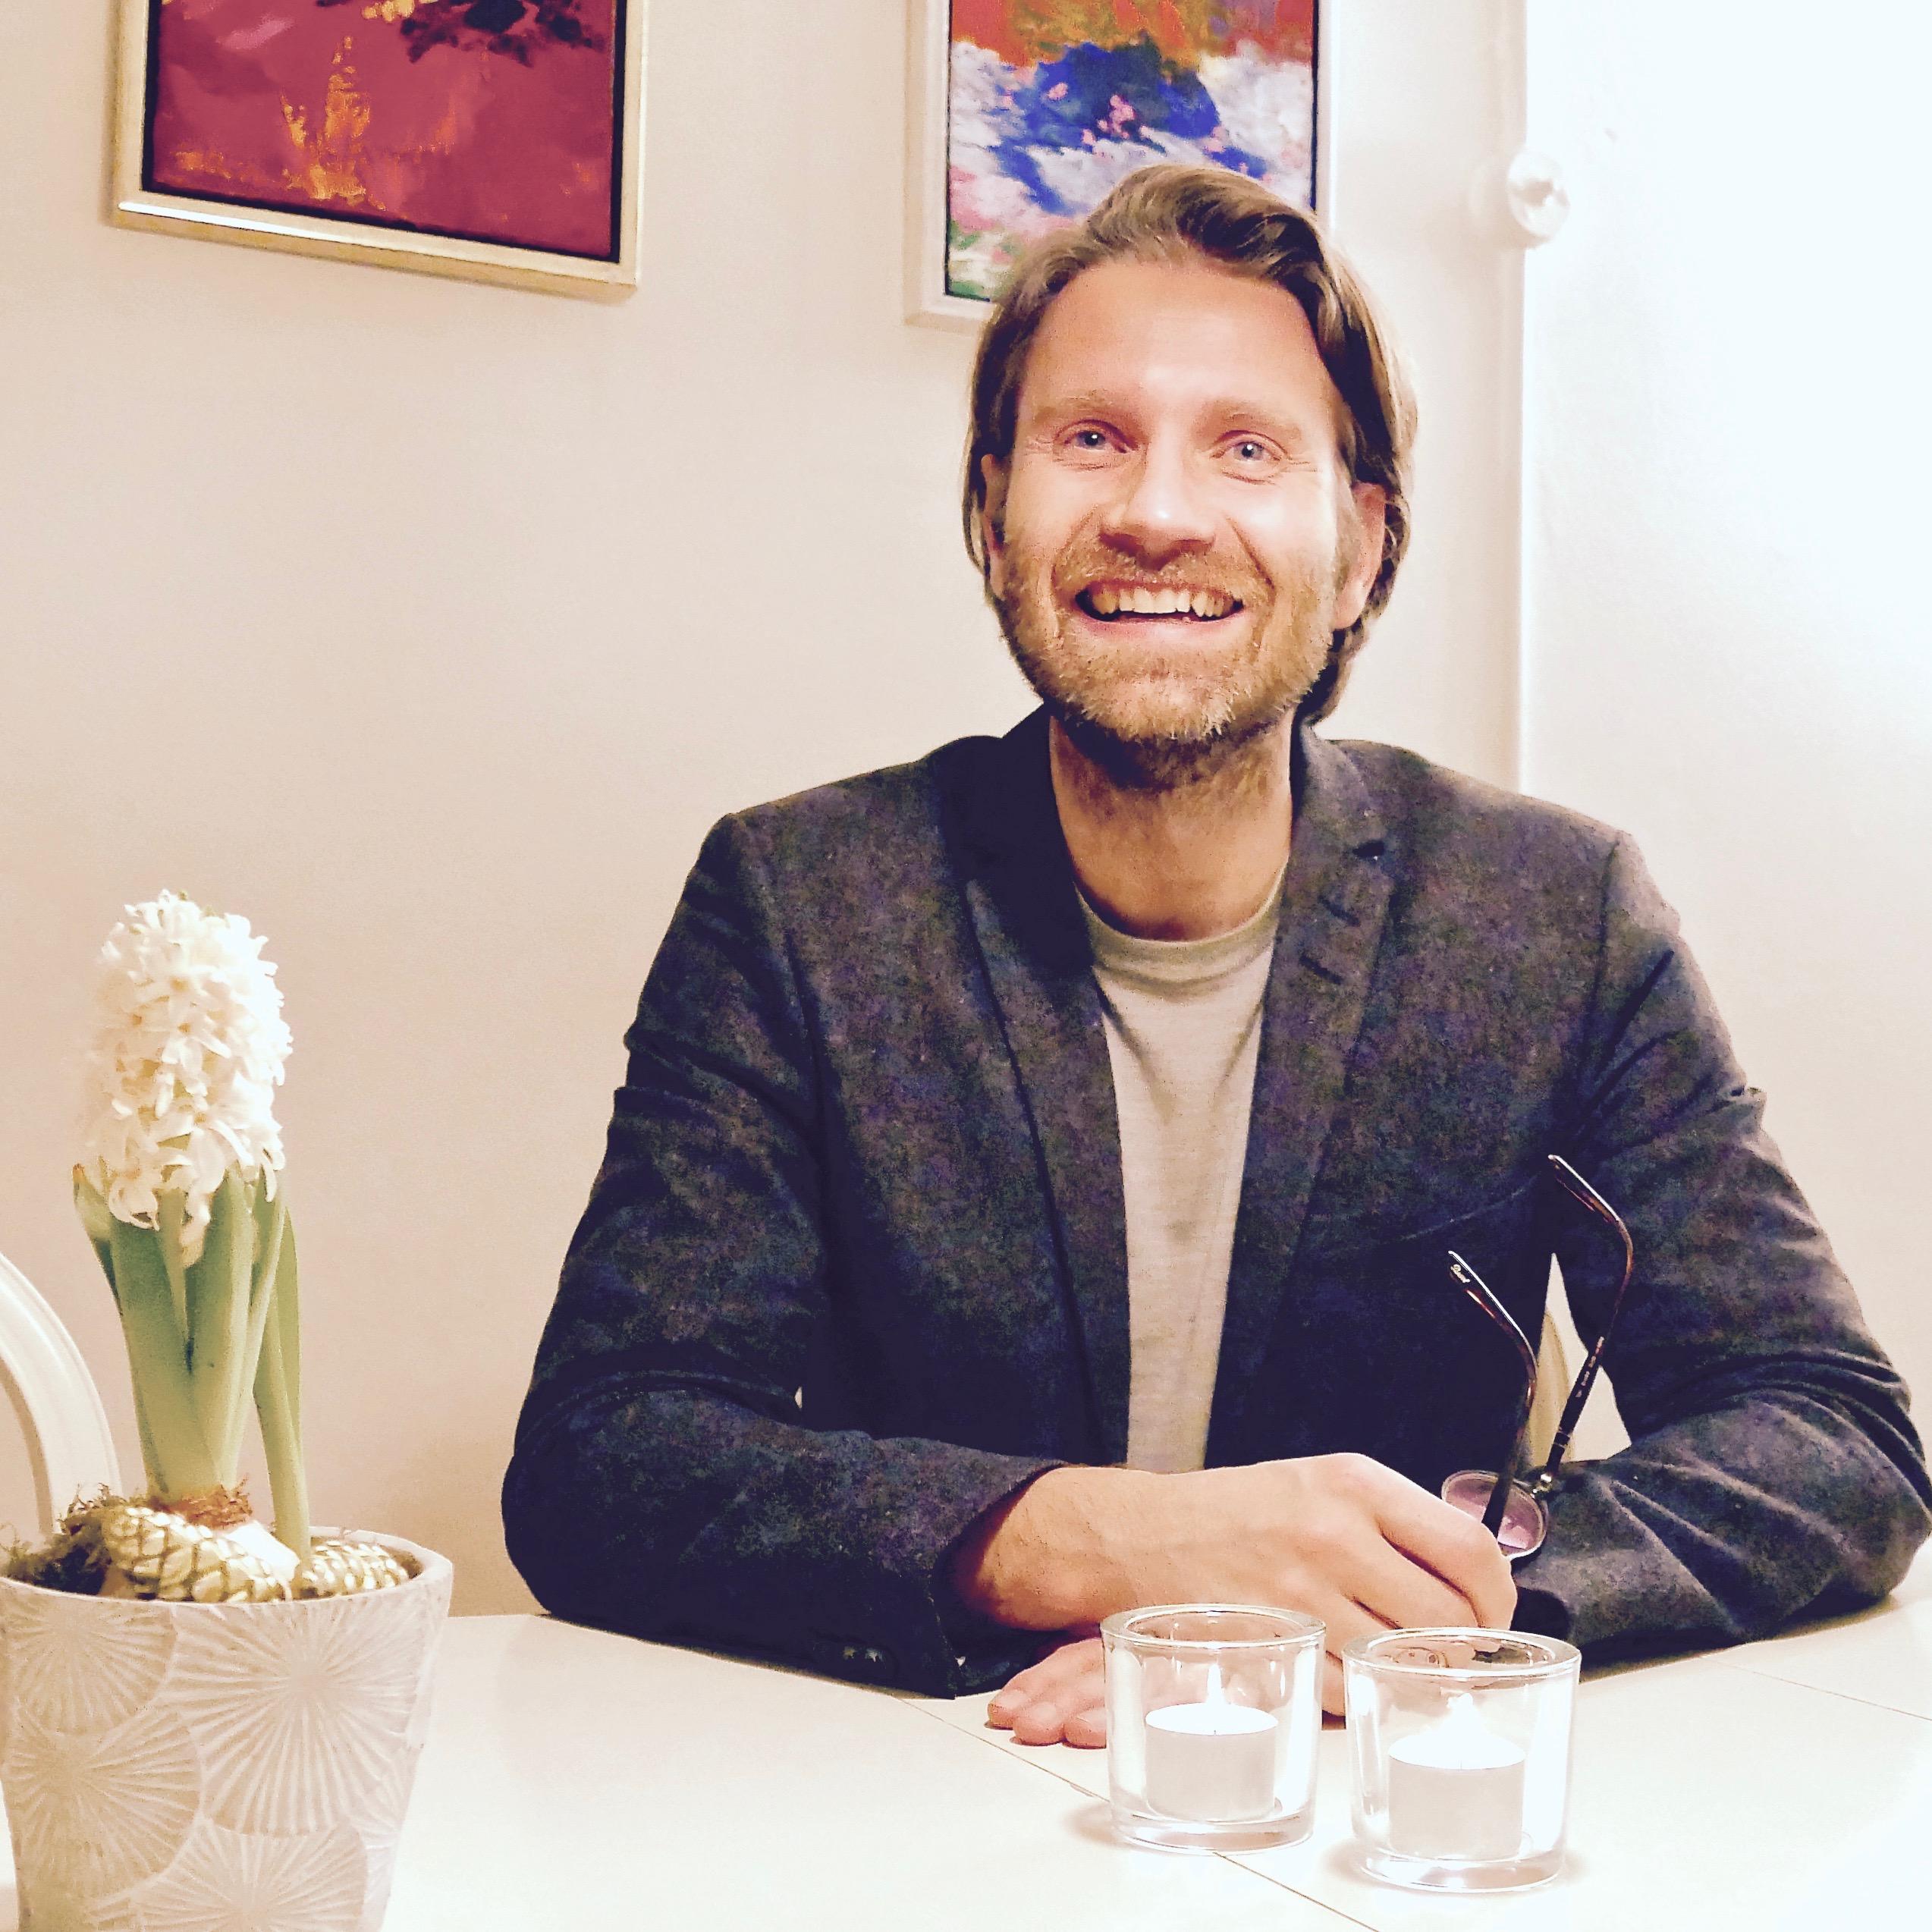 Le bonheur danois selon Meik Wiking